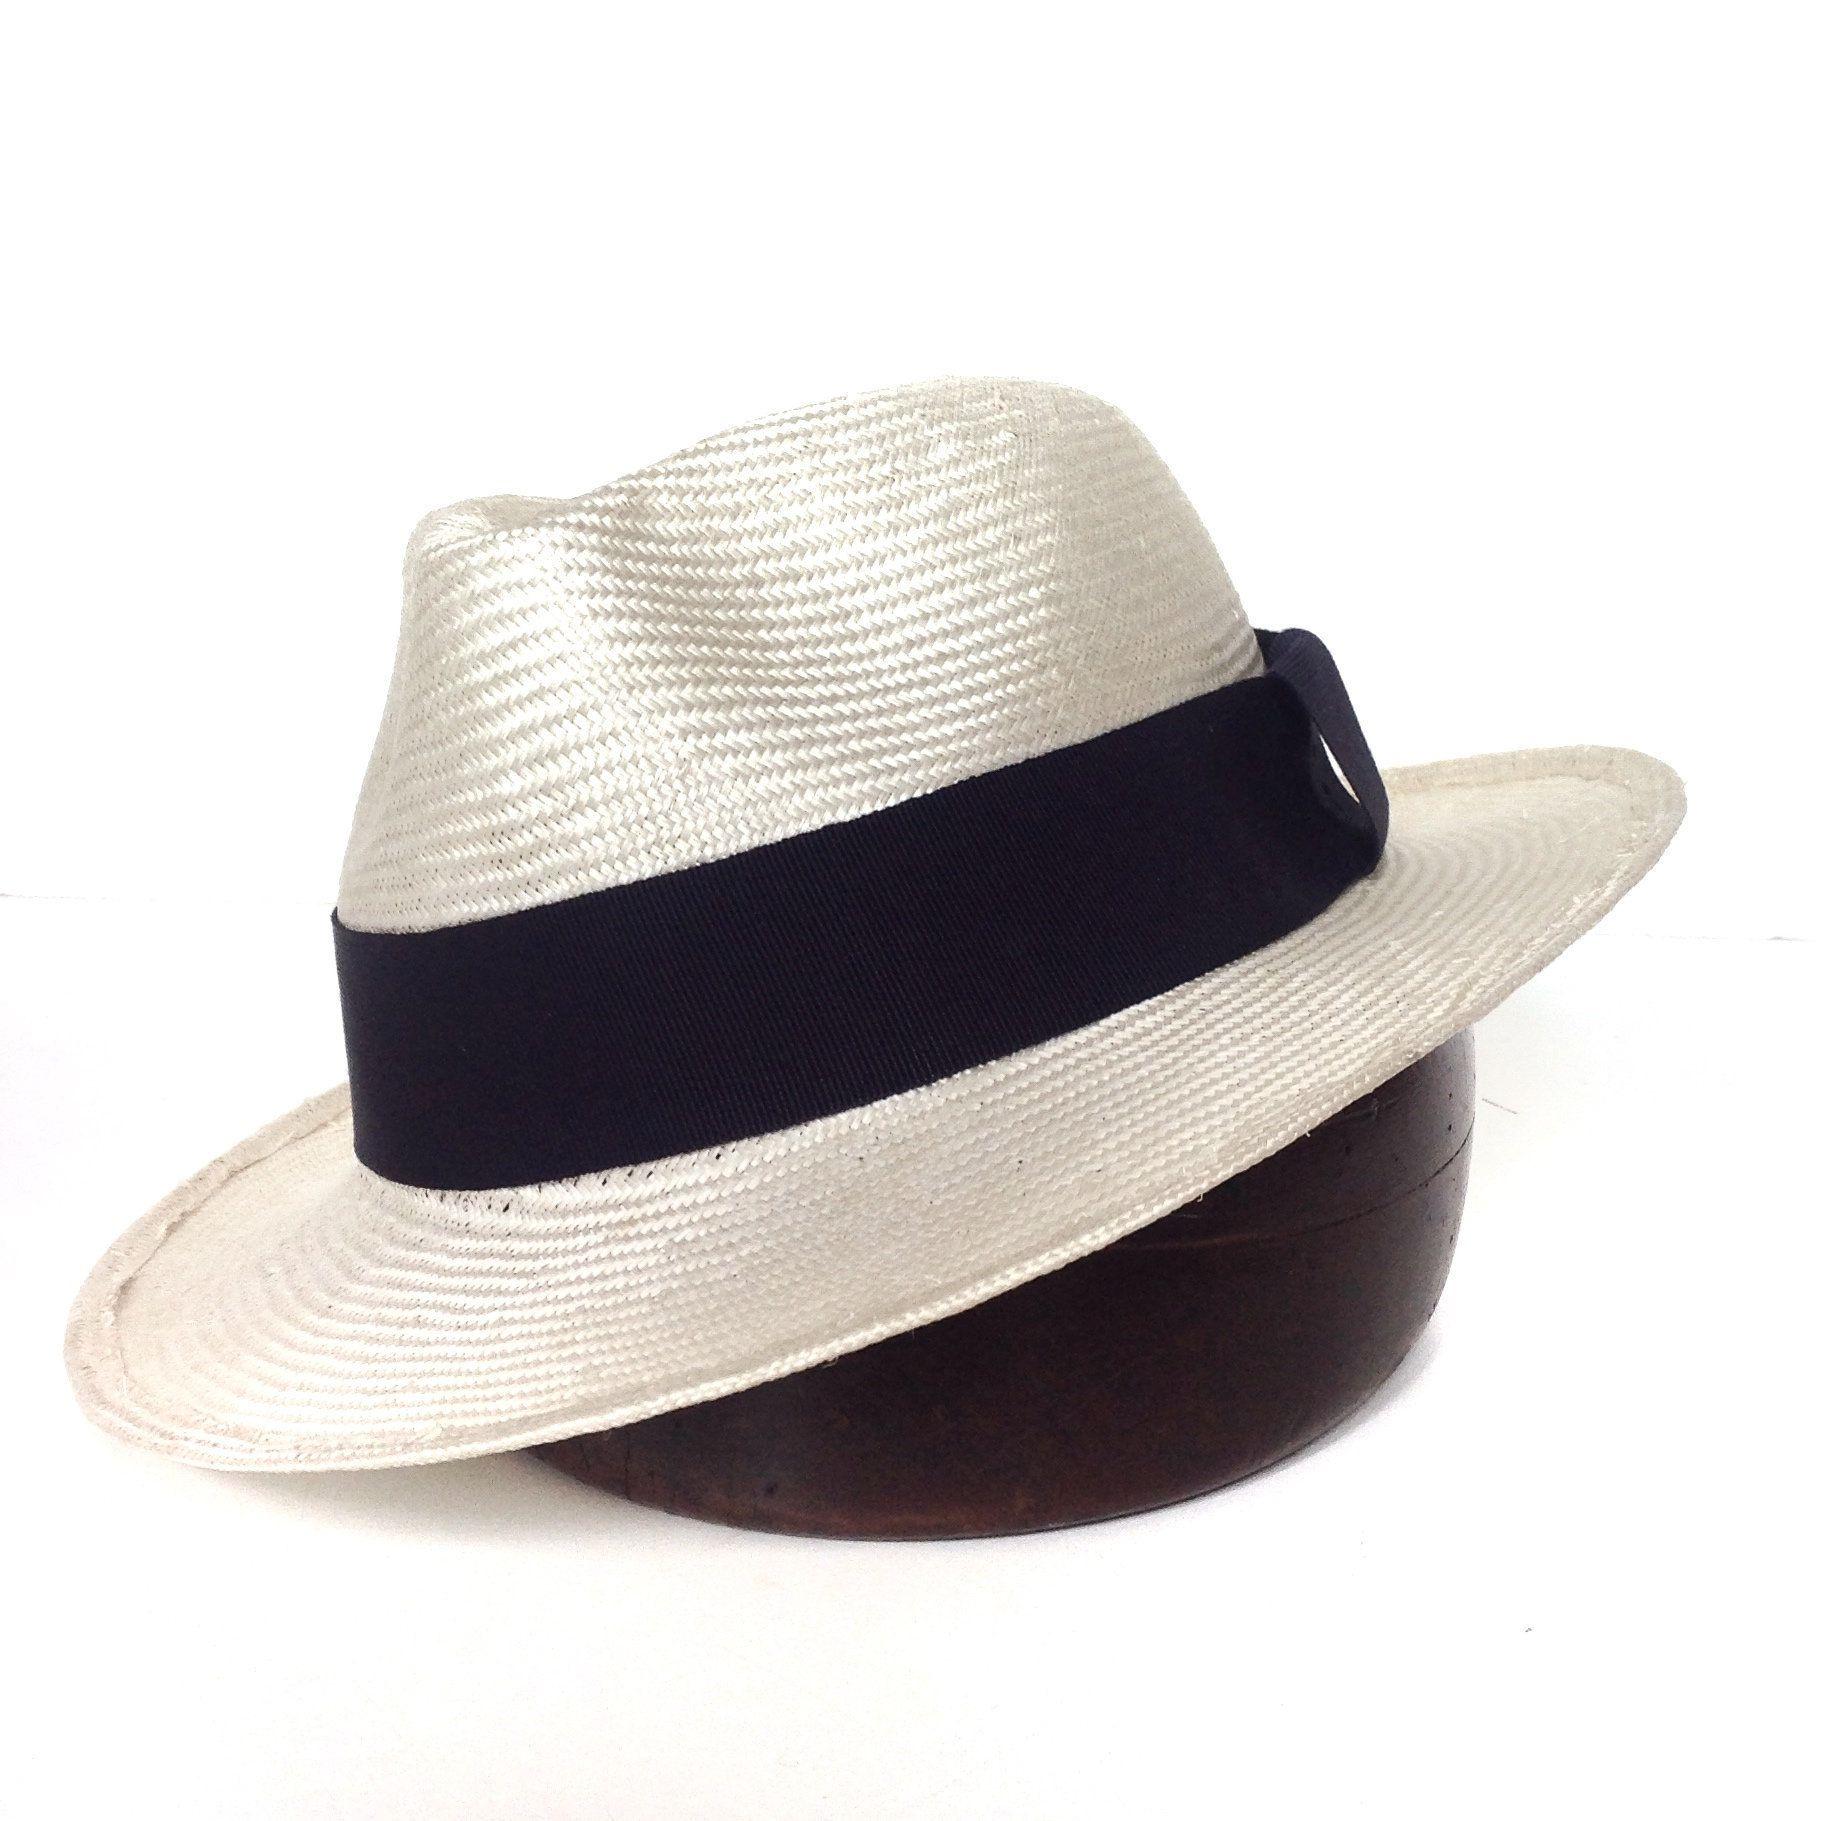 Straw fedora hat. White panama For men. Cruise hat medium brim ... 8bb1a3d50f5b